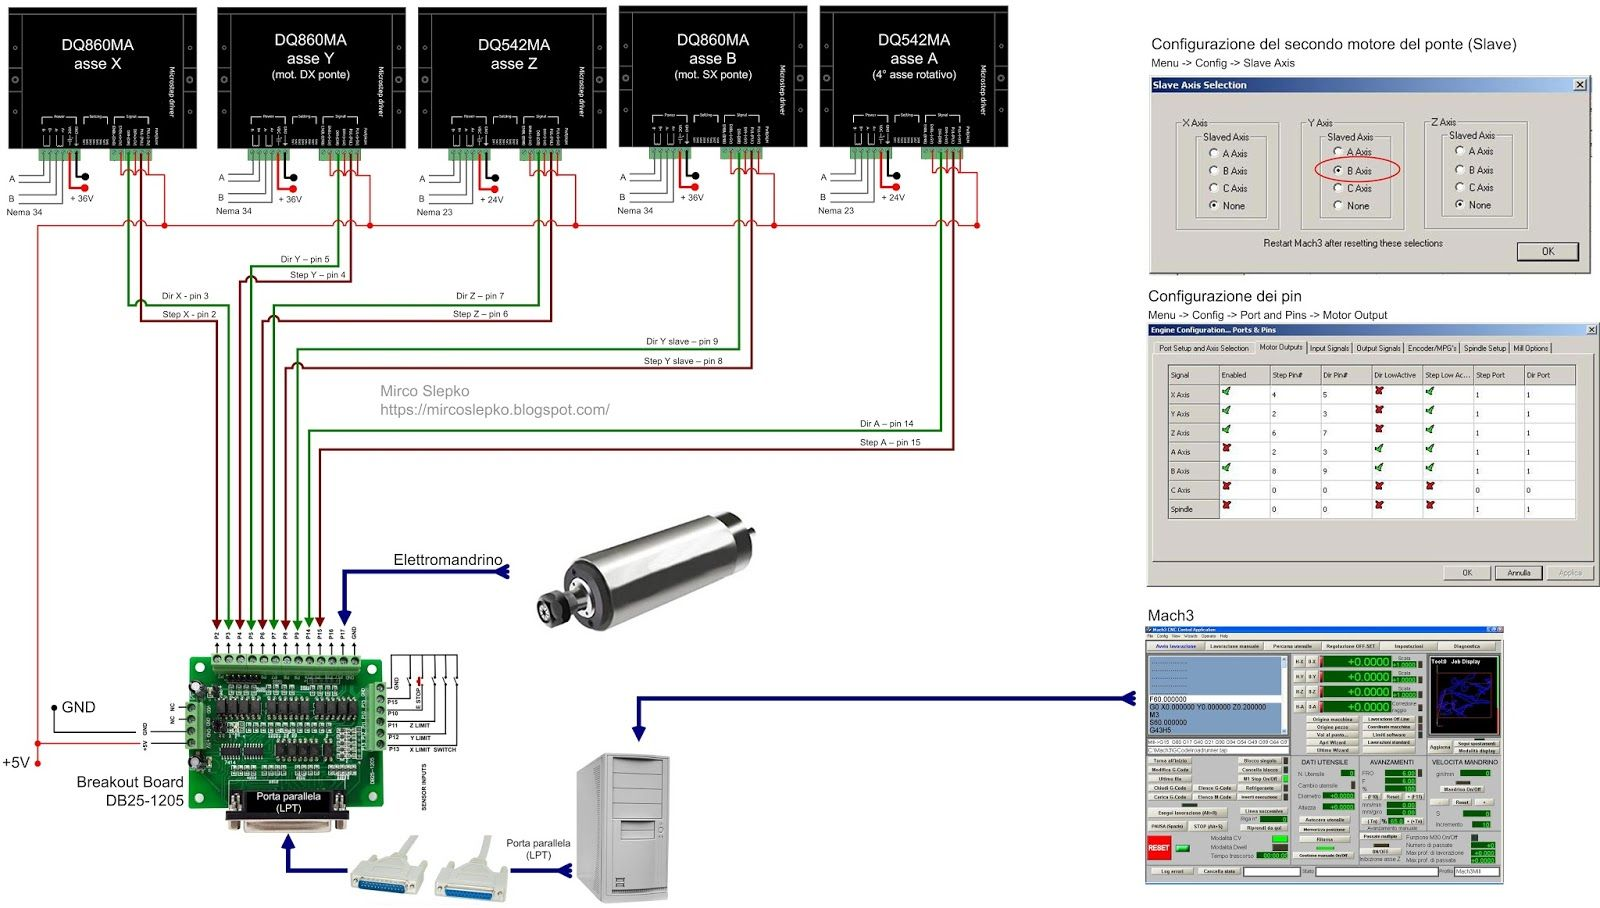 cnc router wiring diagram 220v single phase transformer db25 1205 dq860ma driver dq542ma